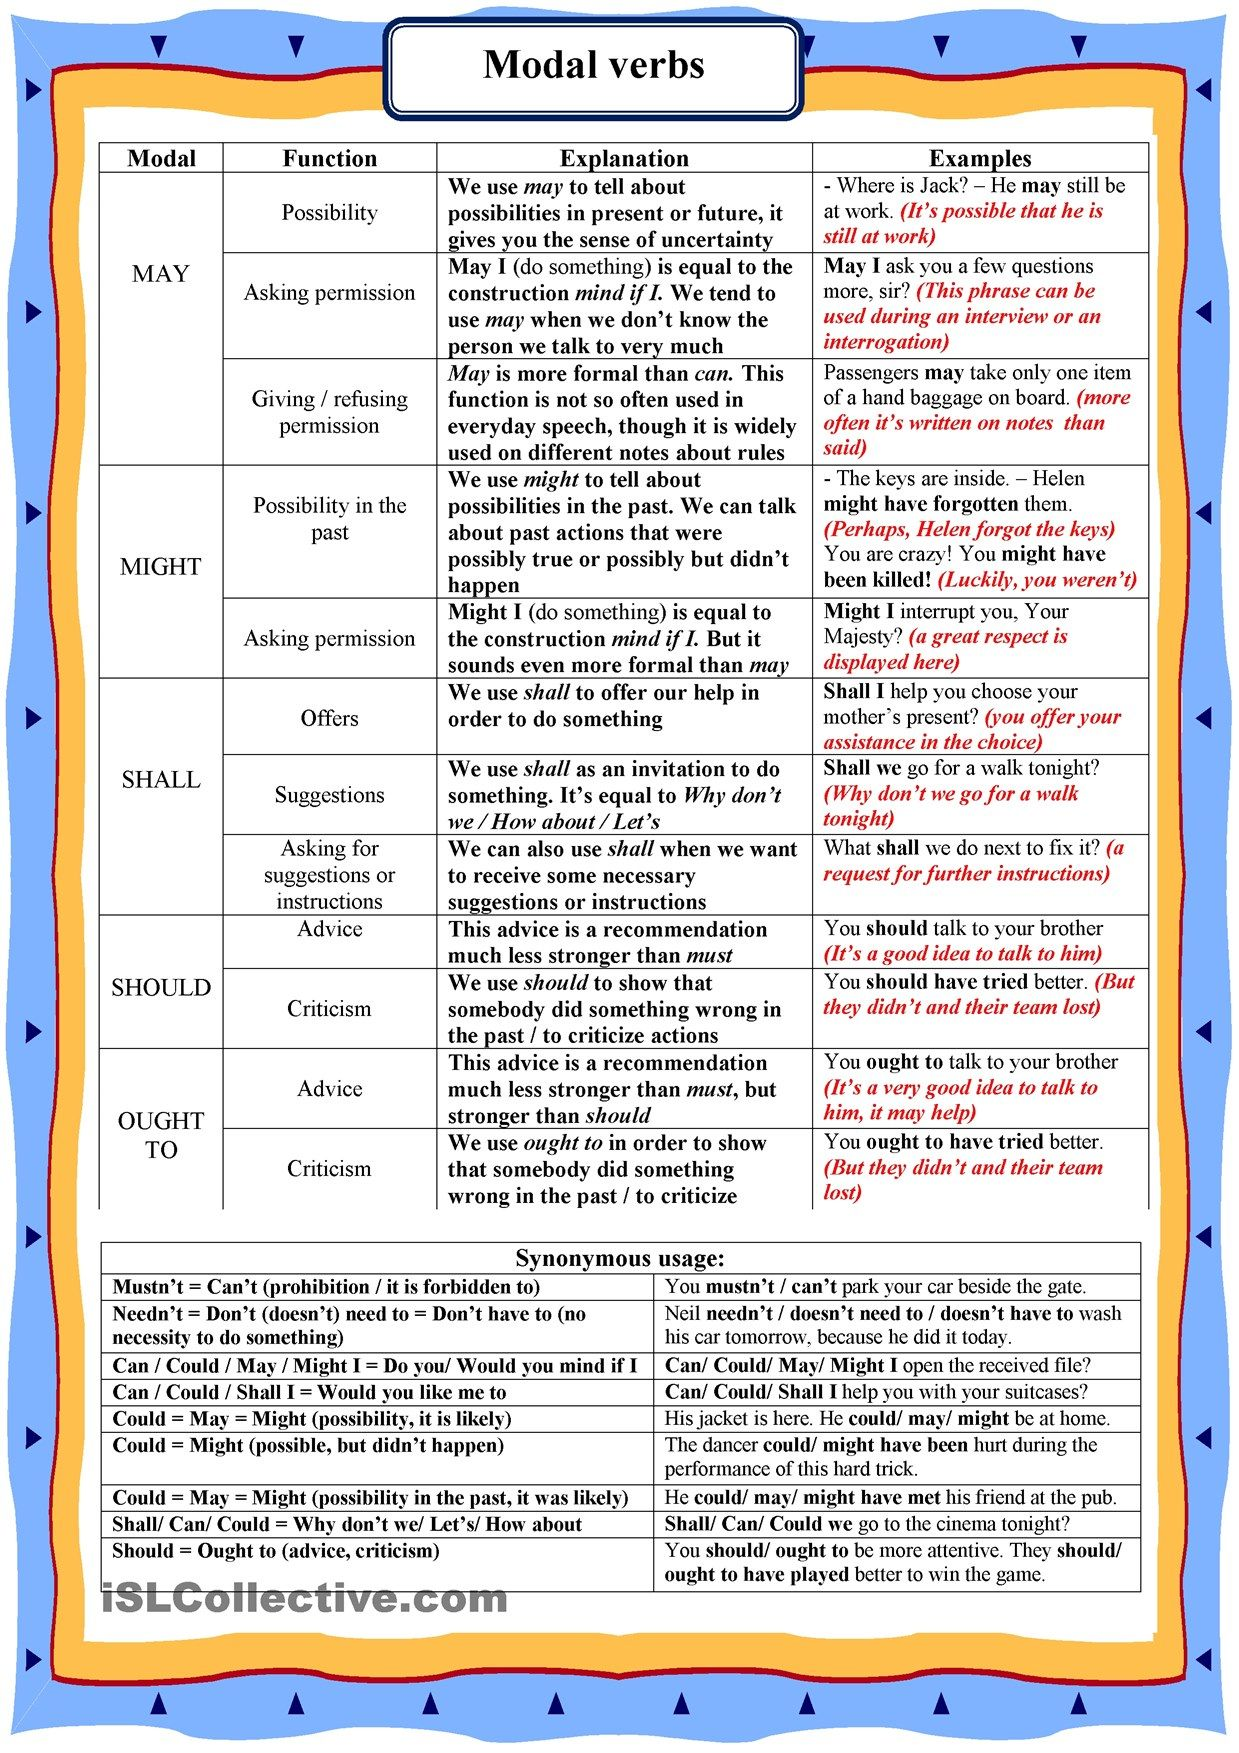 Modal Verbs English Grammar English Language Learning English Vocabulary [ 1753 x 1239 Pixel ]